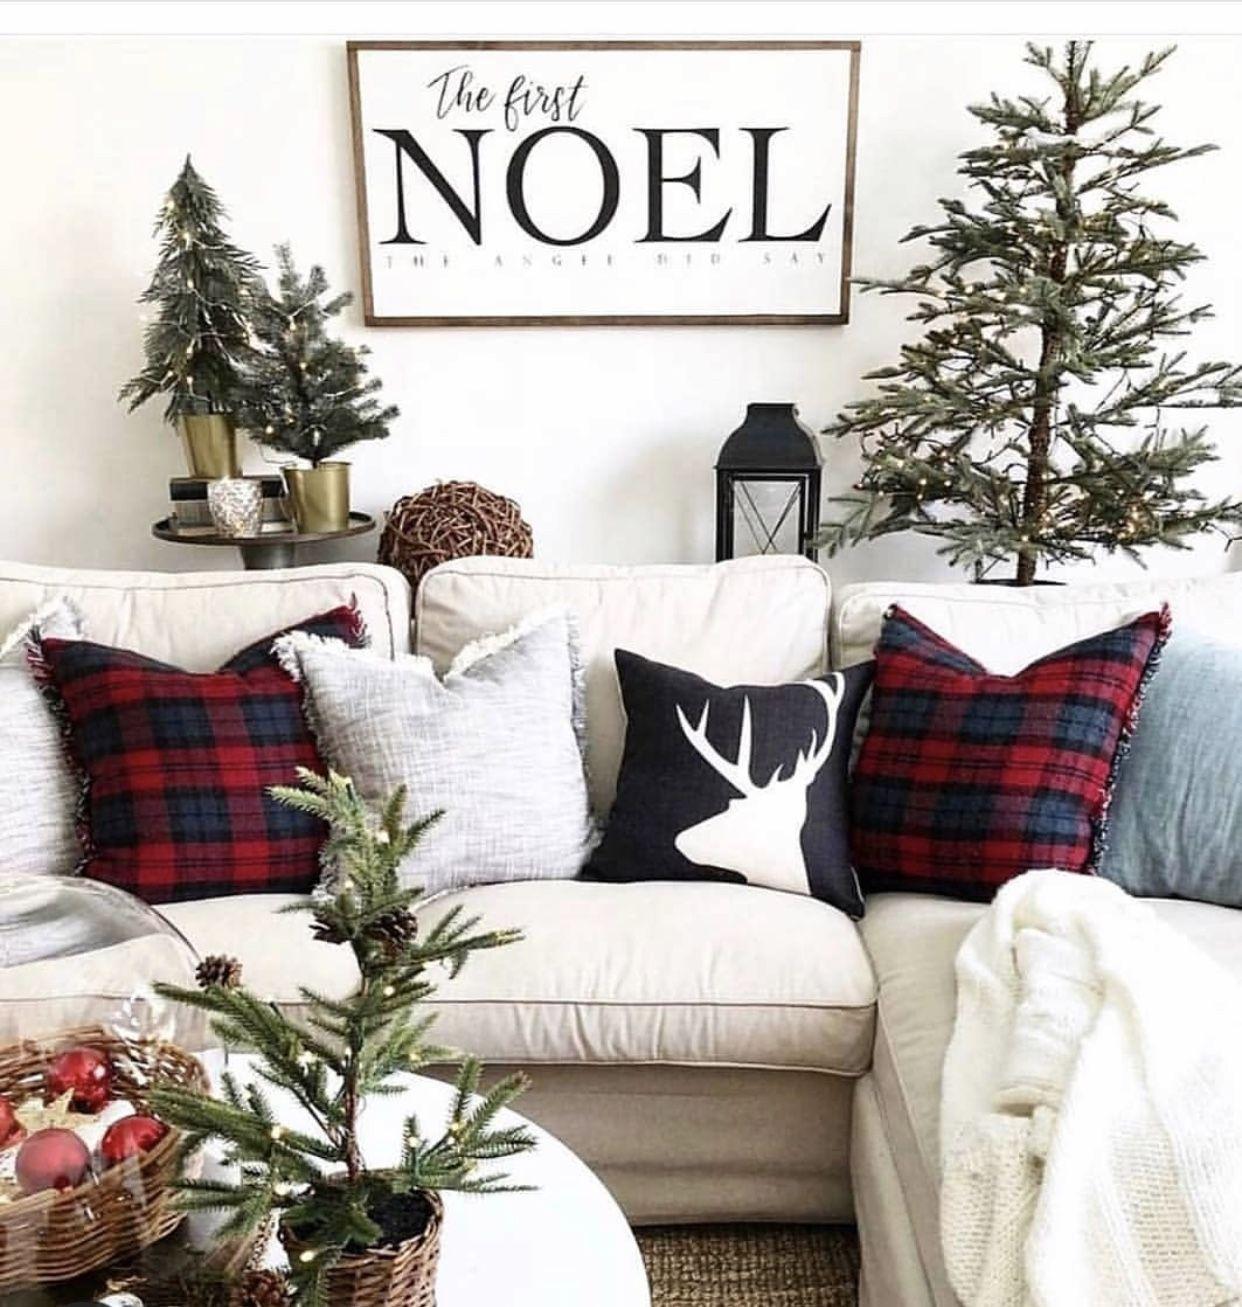 97 Farmhouse Christmas Decor Ideas For Your Home - Chaylor & Mads